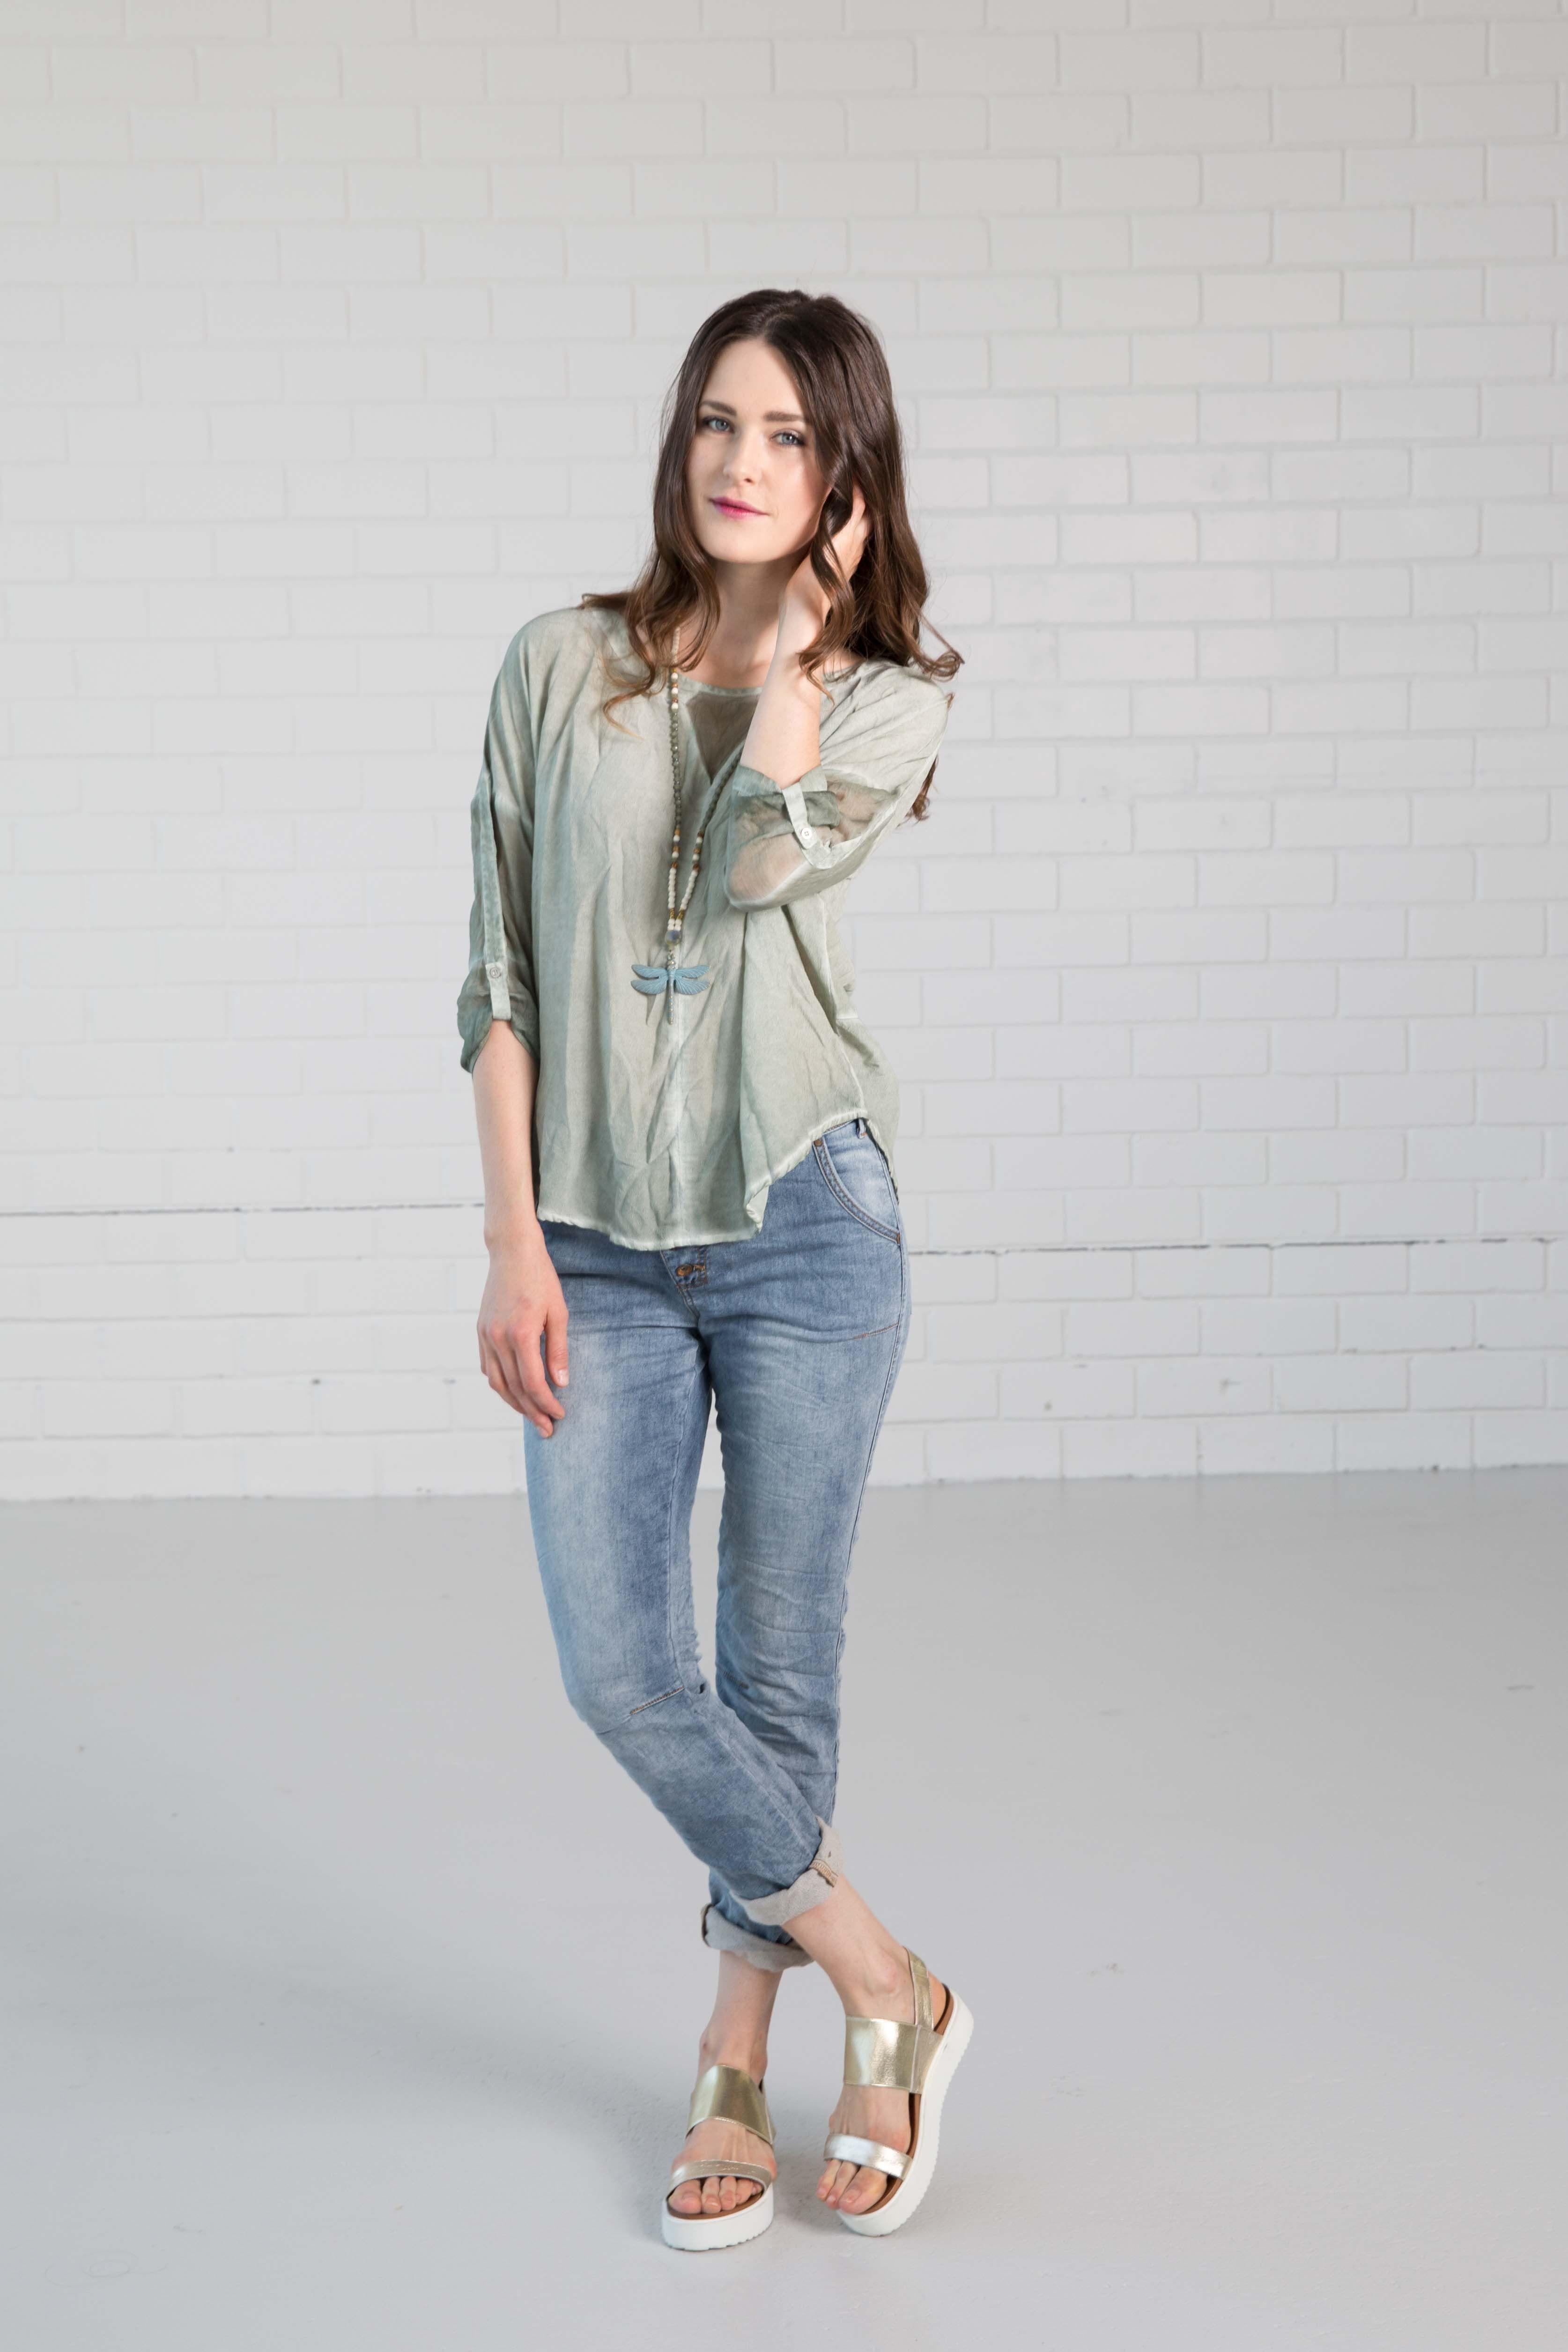 NILE - Primavera 2017 - Cosy Wavy Long-sleeve Grey blouse Blue Denim jeans. #lookbookoutfits #lookbookfashion #lookbookphotoshoots